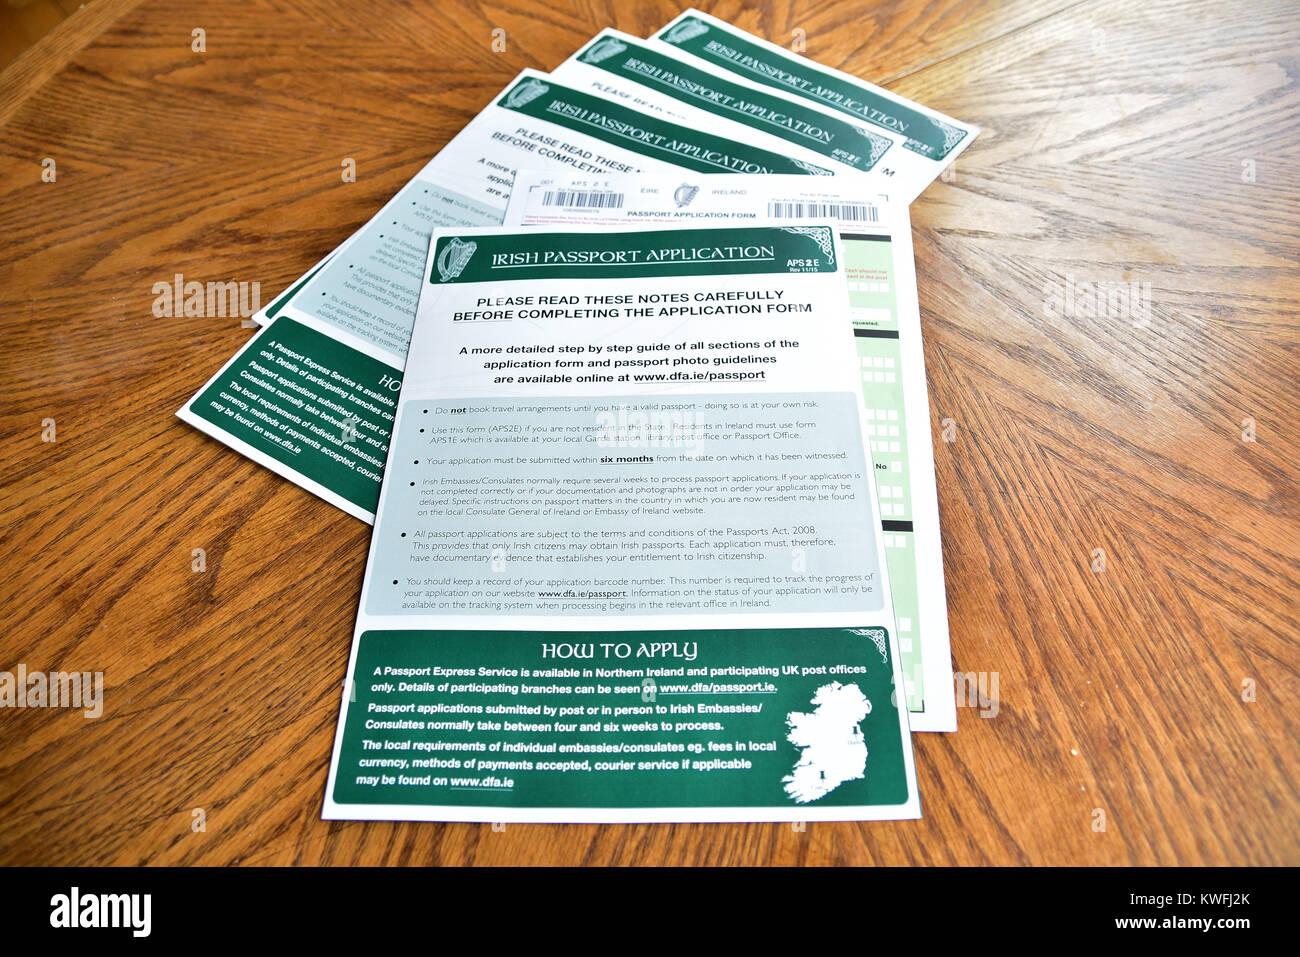 British Passport Application Form Stock Photos British Passport